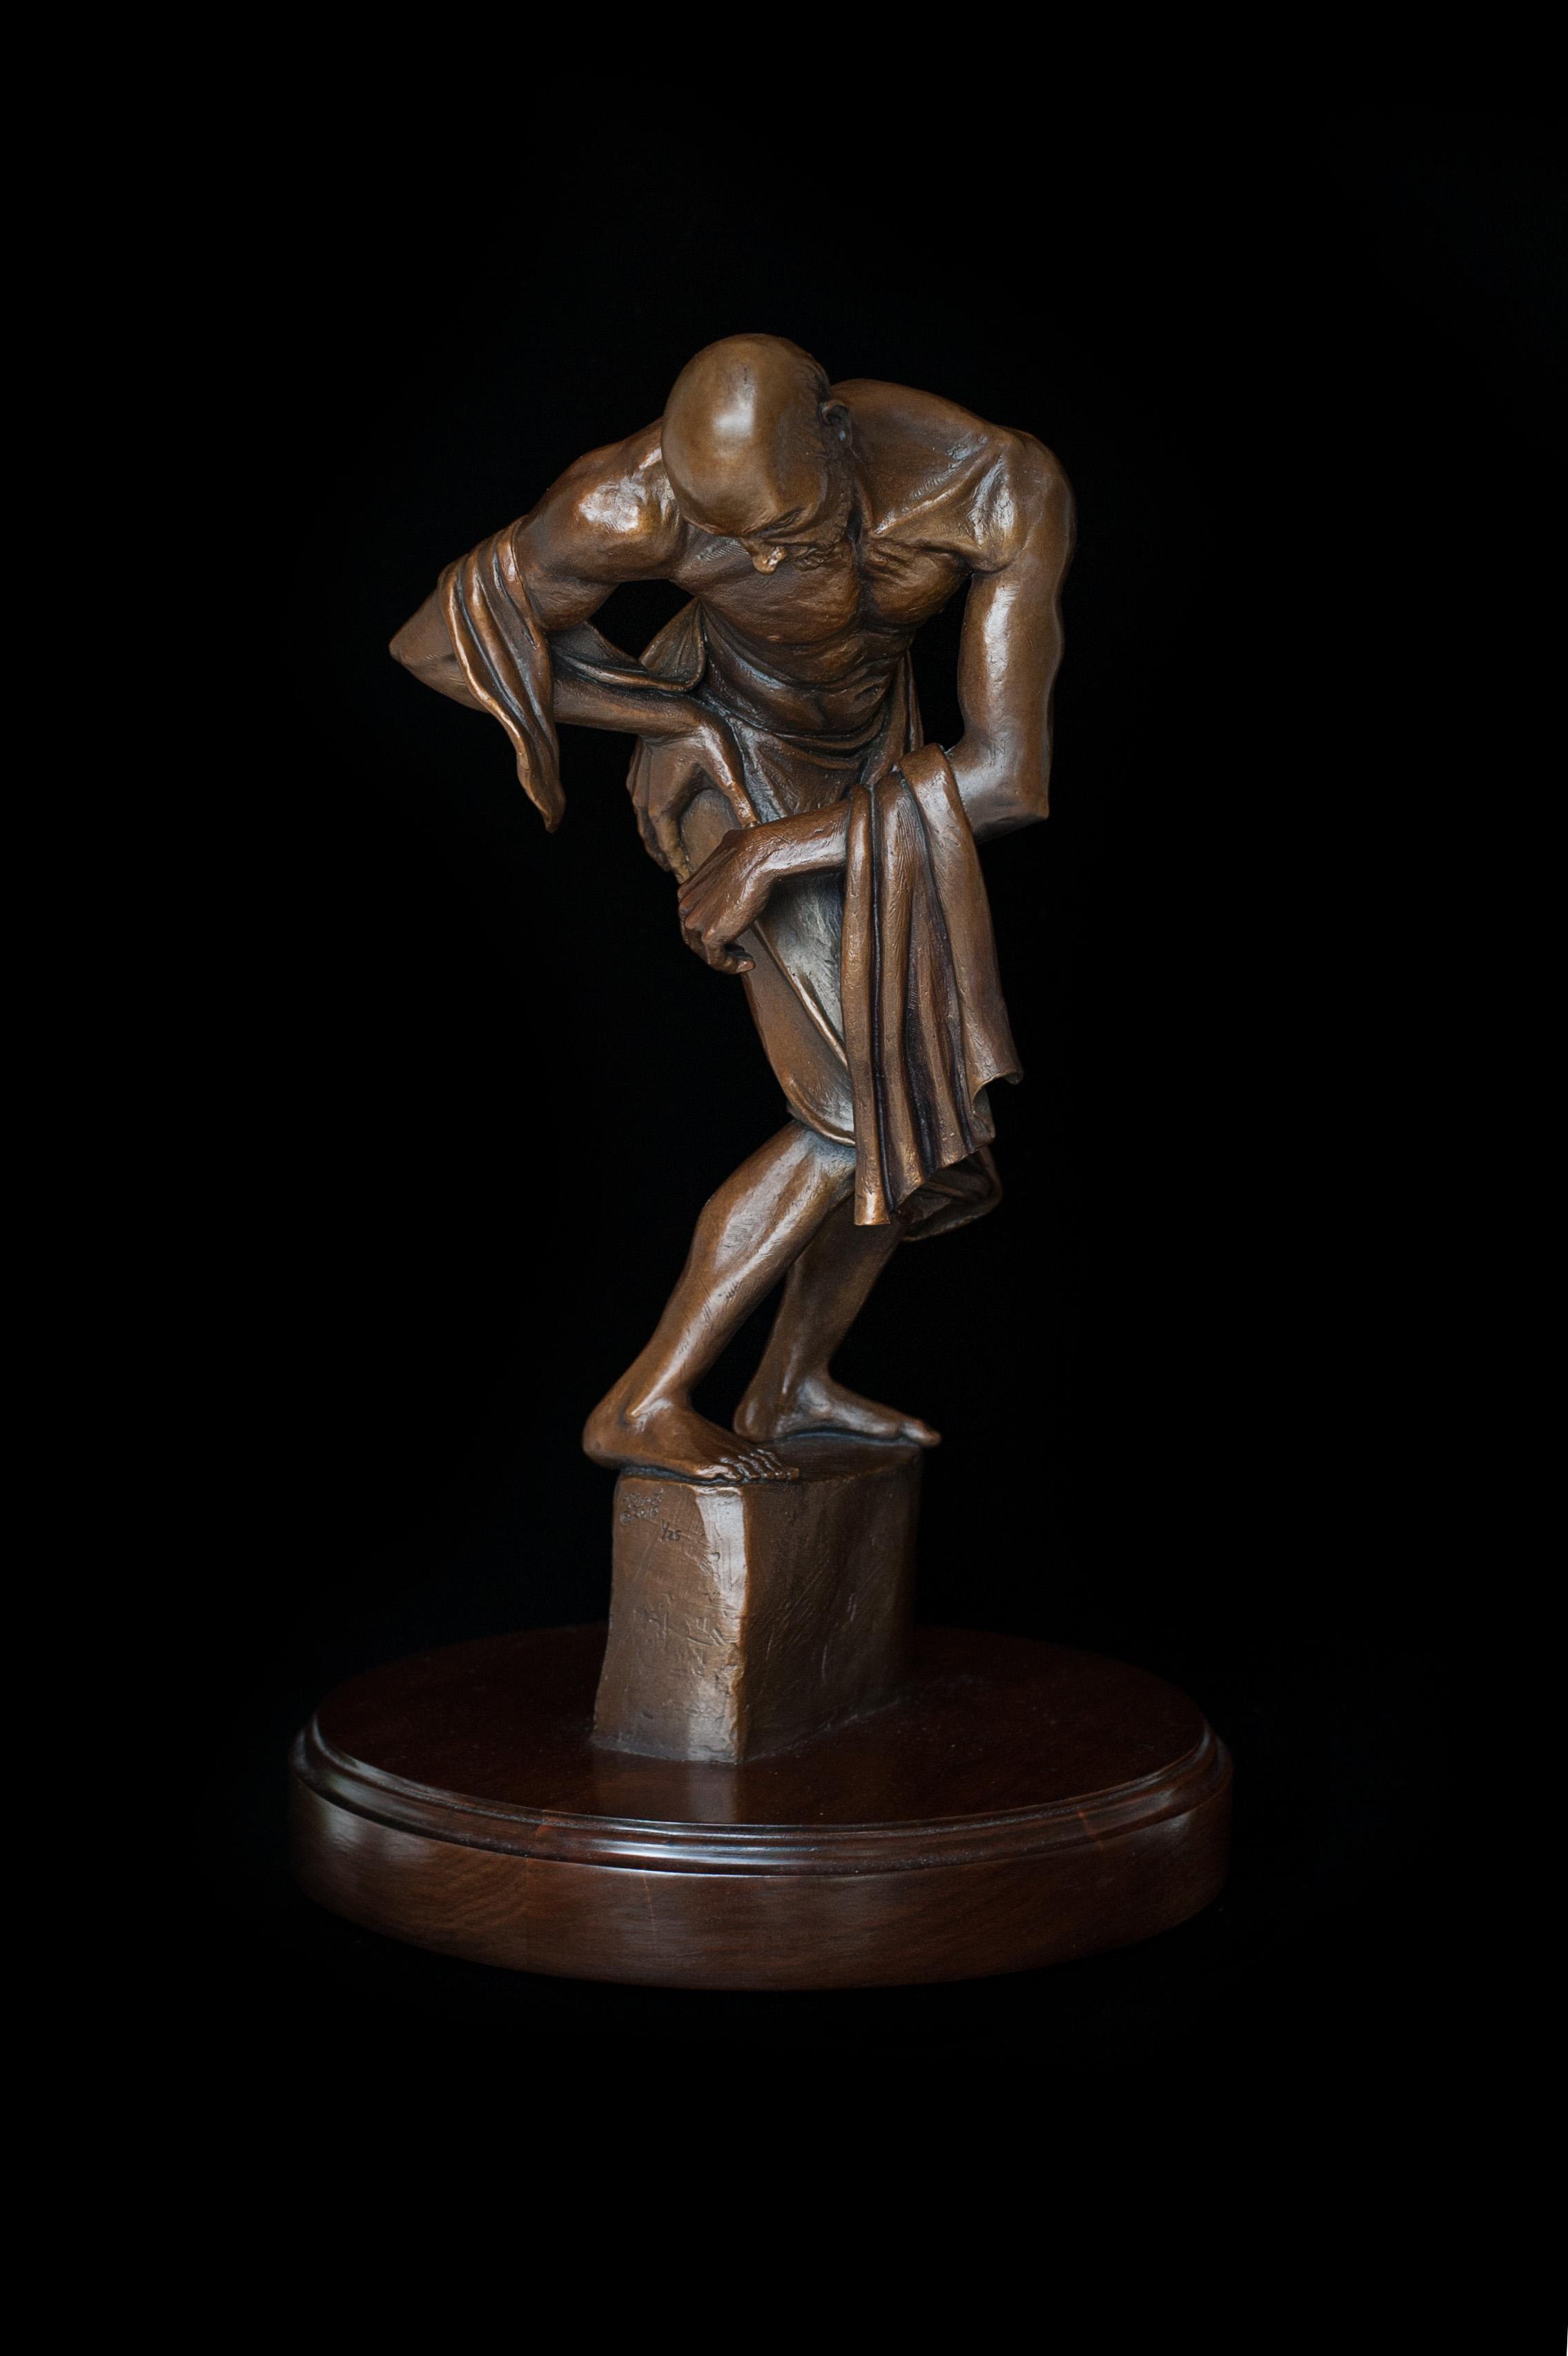 2016.bronze.8.5Wx9Dx16.5H (1).jpg